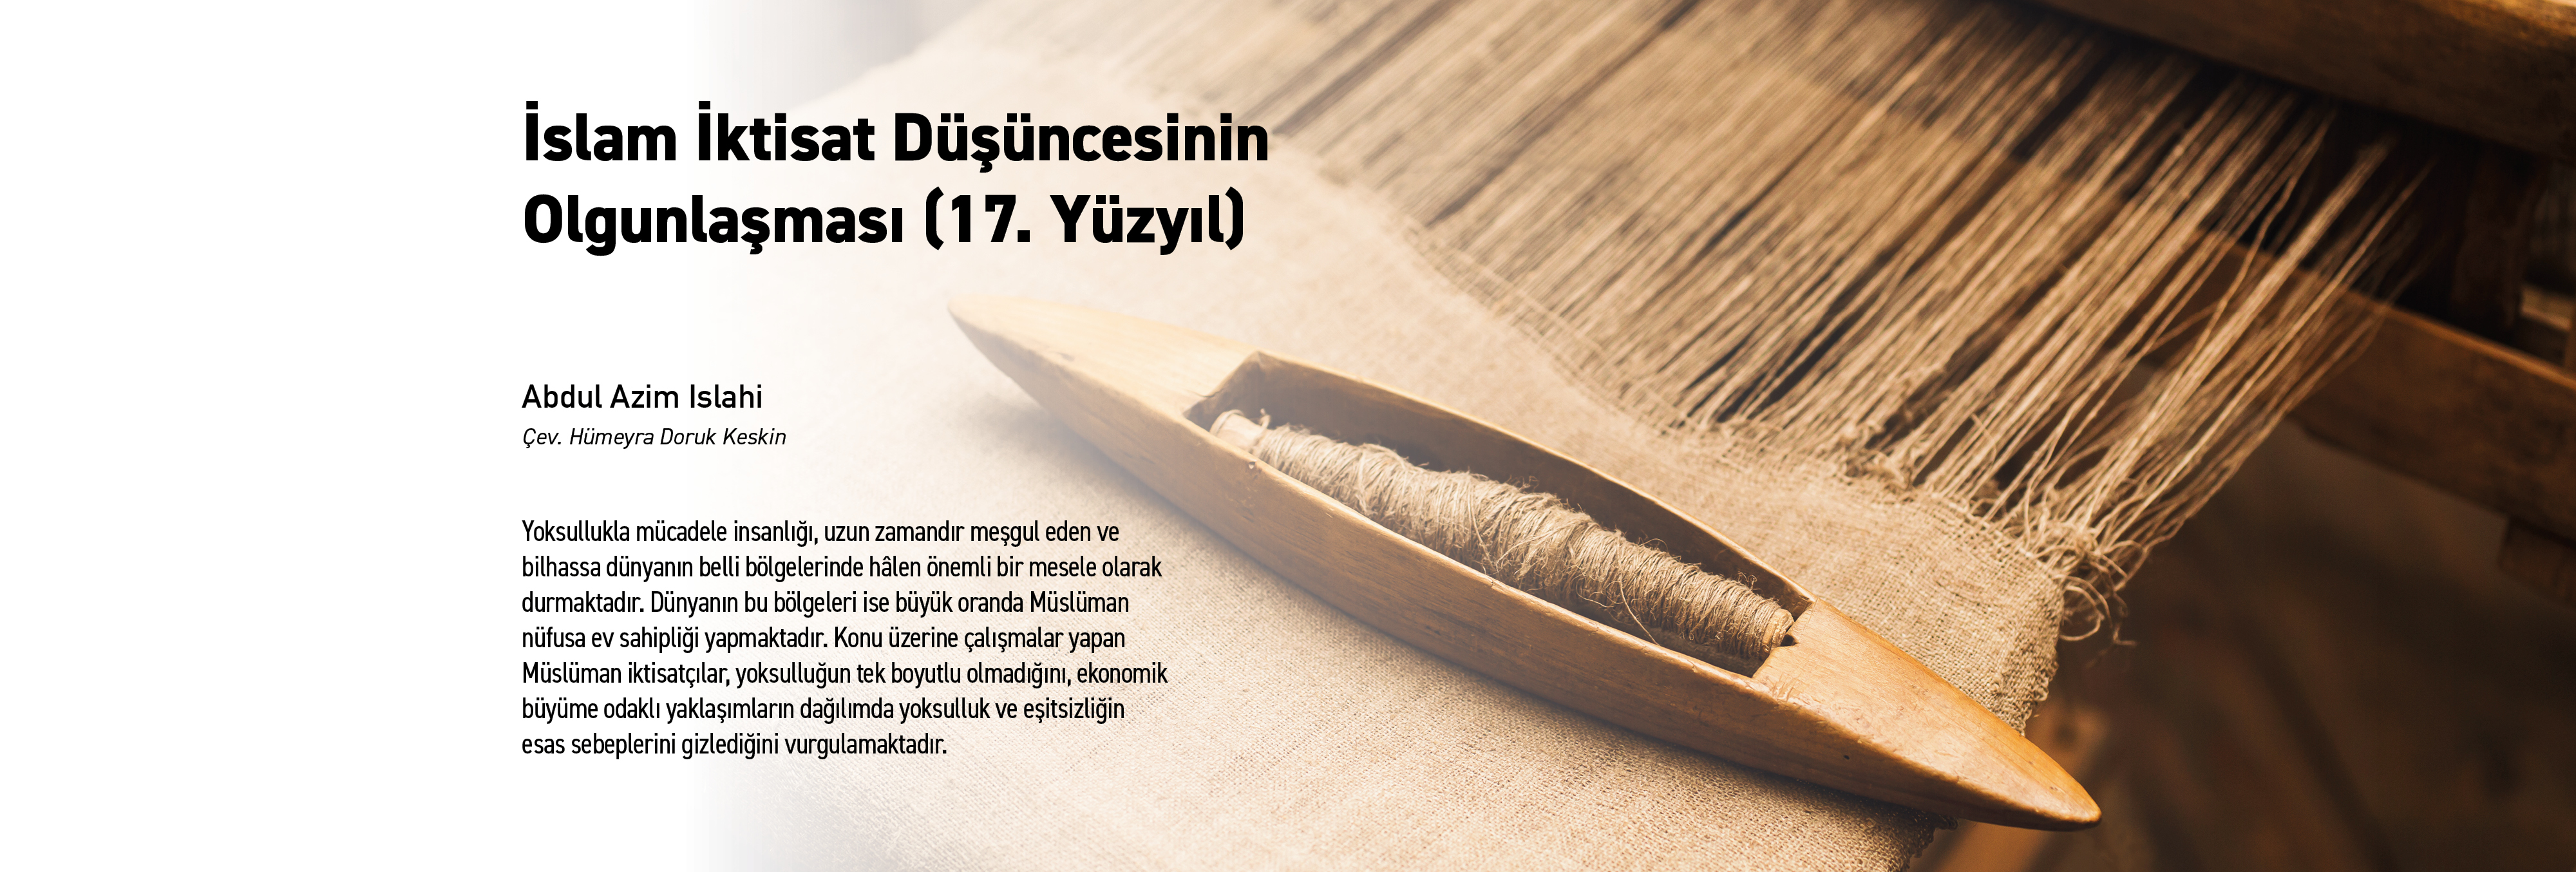 http://www.iktisatyayinlari.com/content/1-home/iktisaty_web_55.jpg